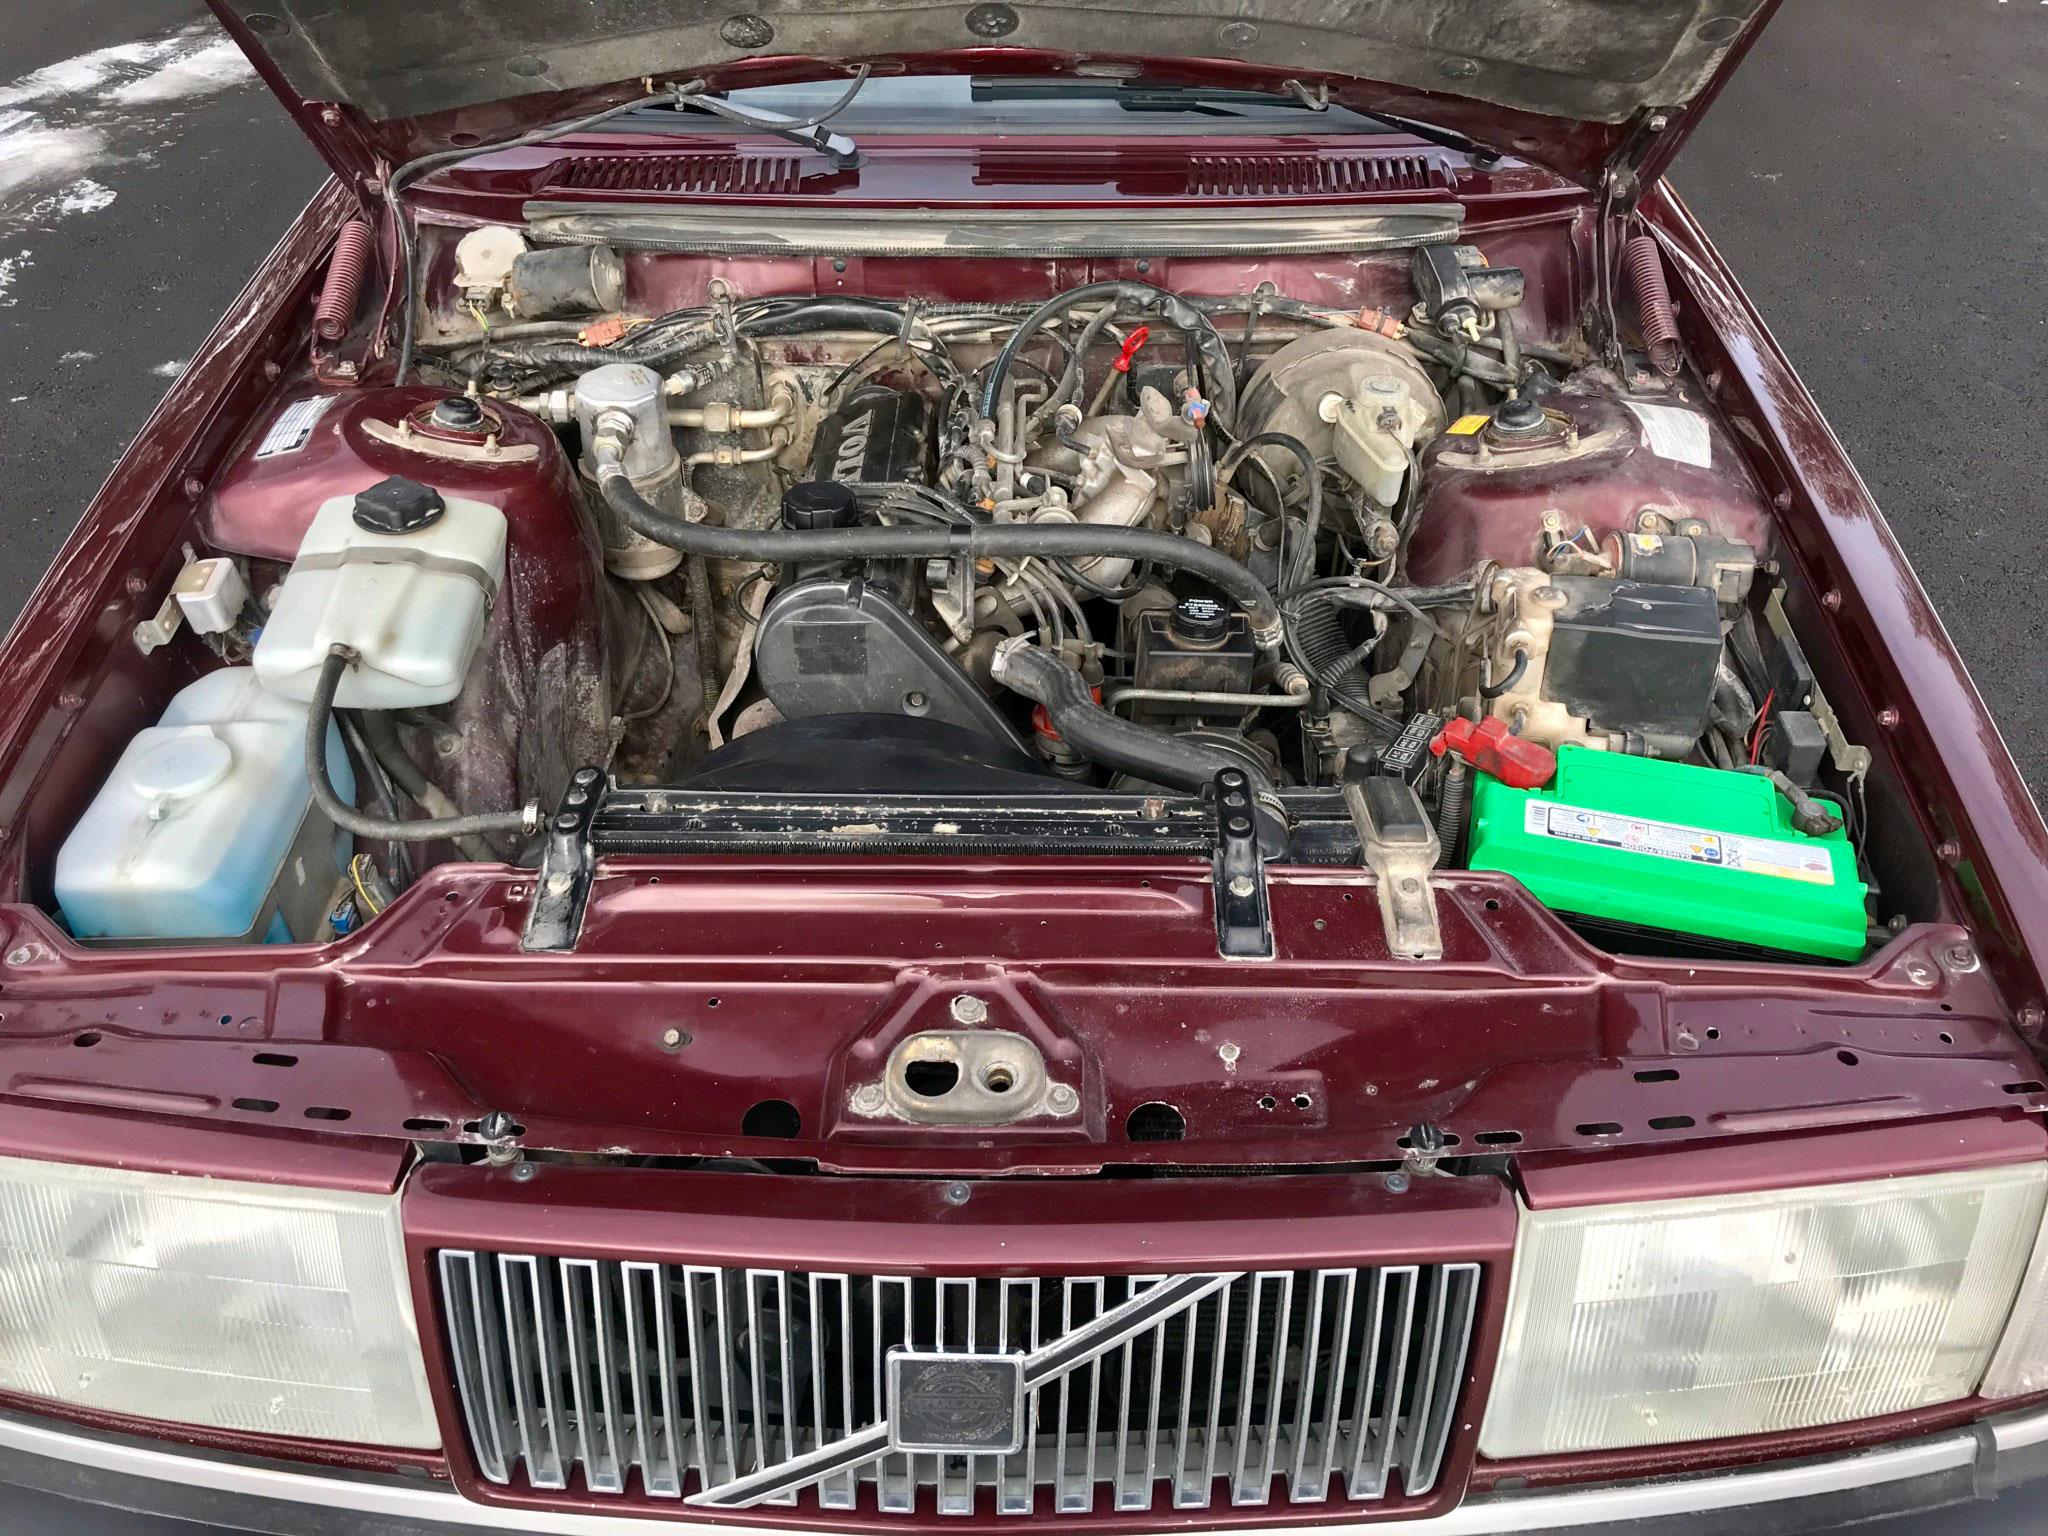 1993 Volvo 240 Classic LE Wagon engine